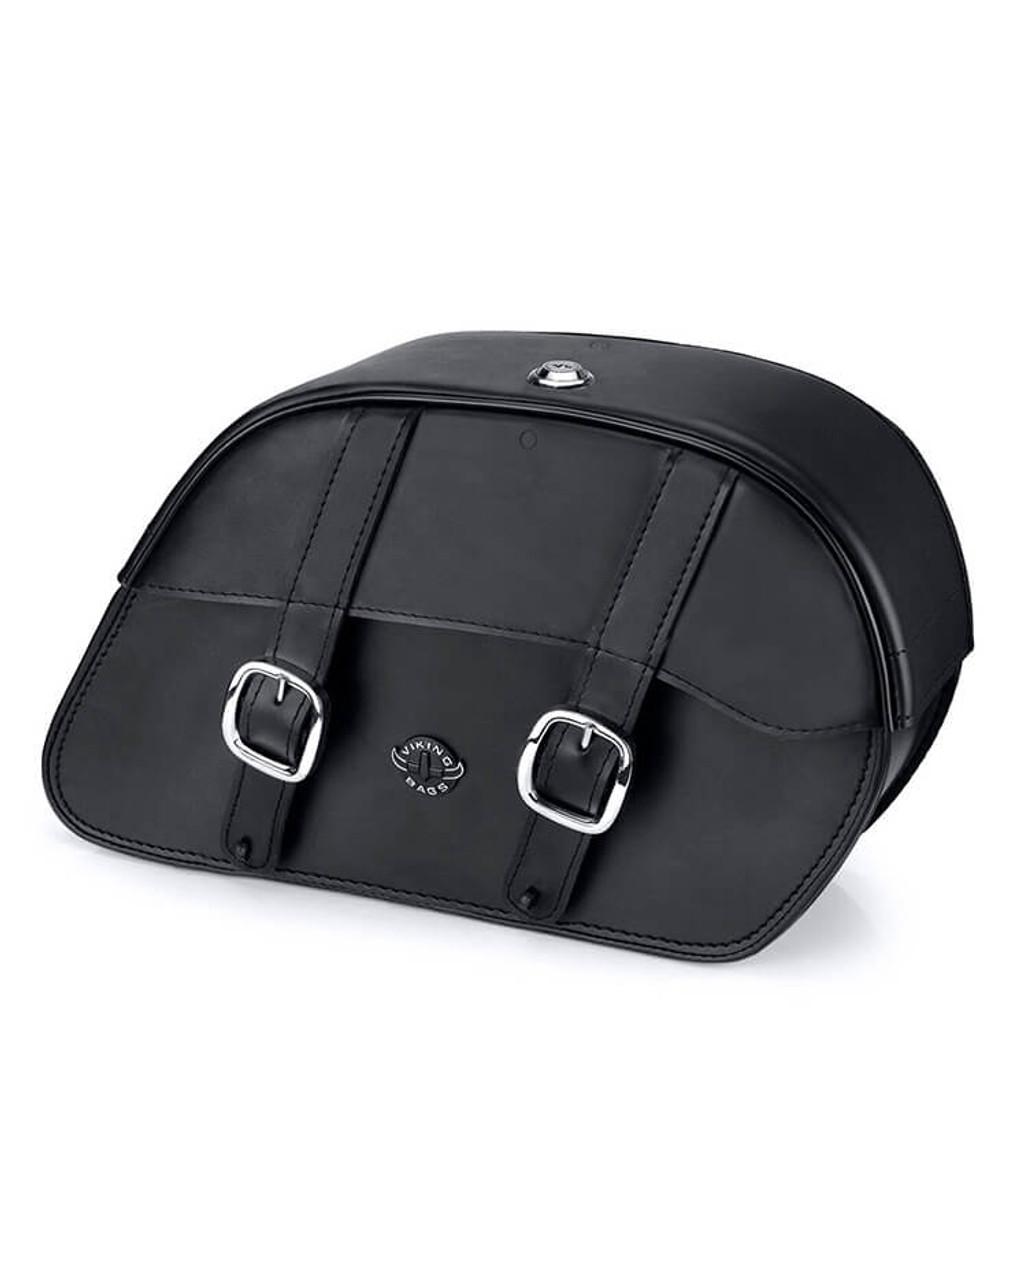 Honda 1500 Valkyrie Interstate Vikingbags Shock Cutout Slanted Large Leather Motorcycle Saddlebags Main Bag View